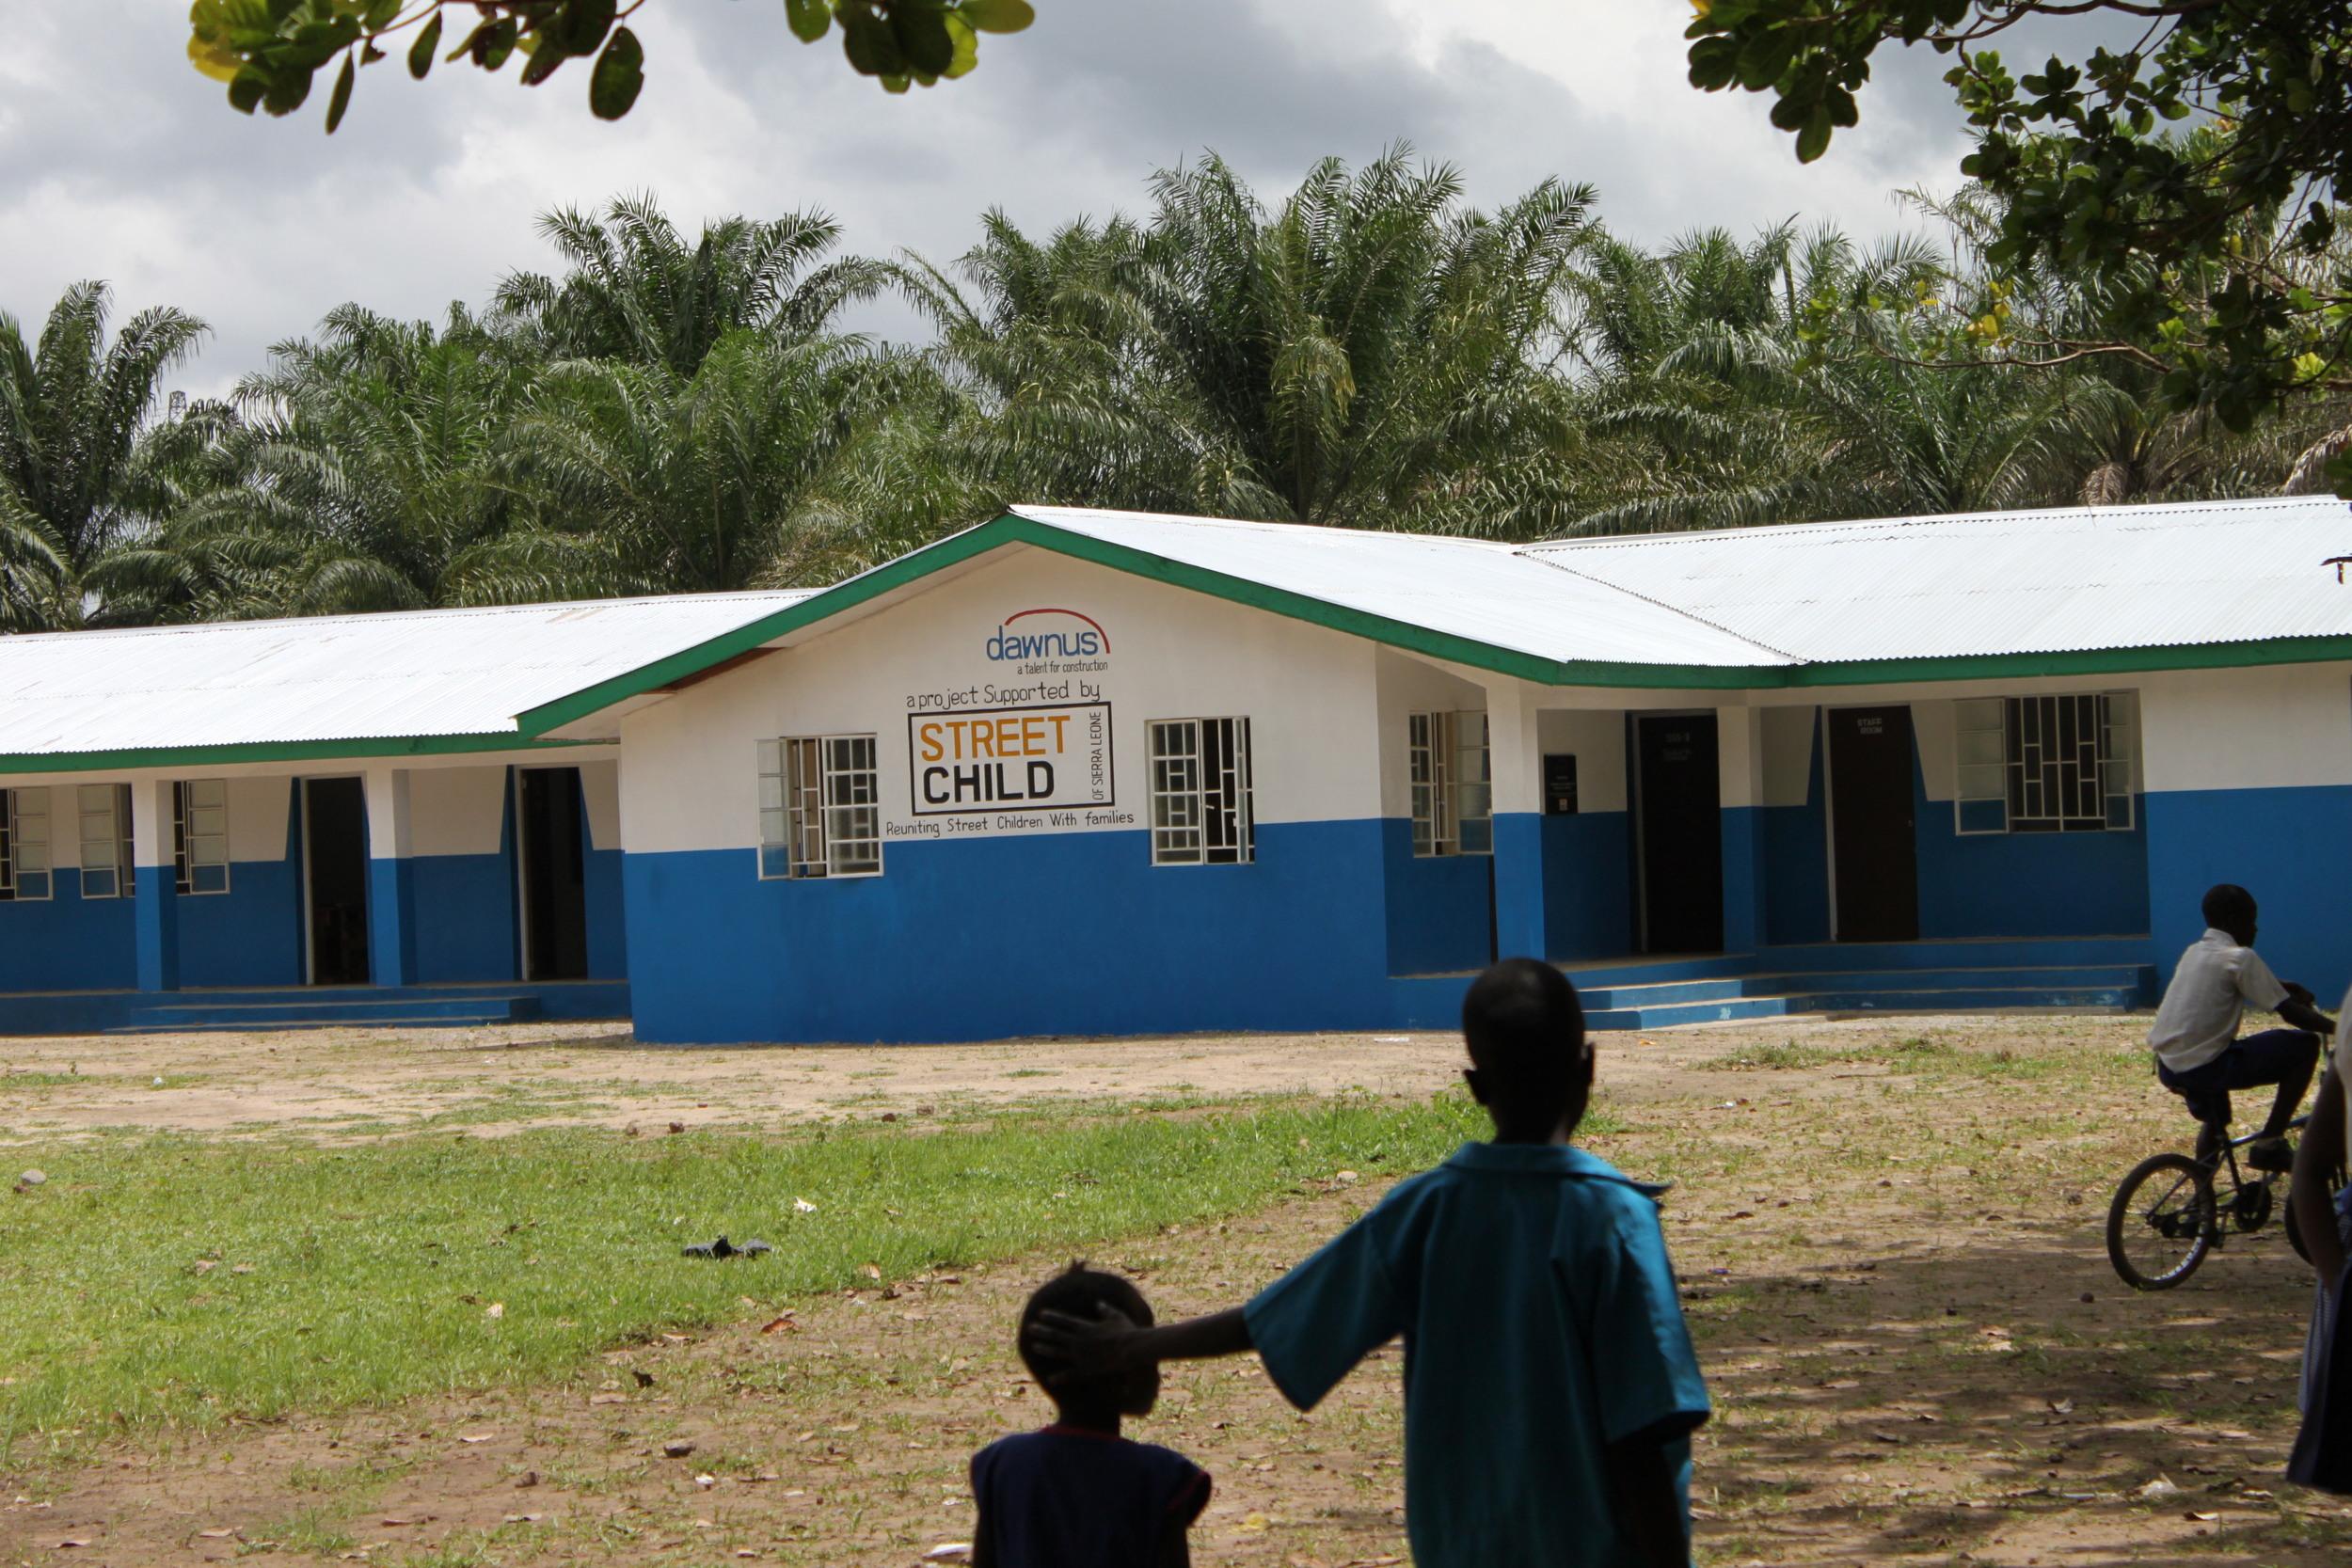 Street Child, our charity partner in Sierra Leone